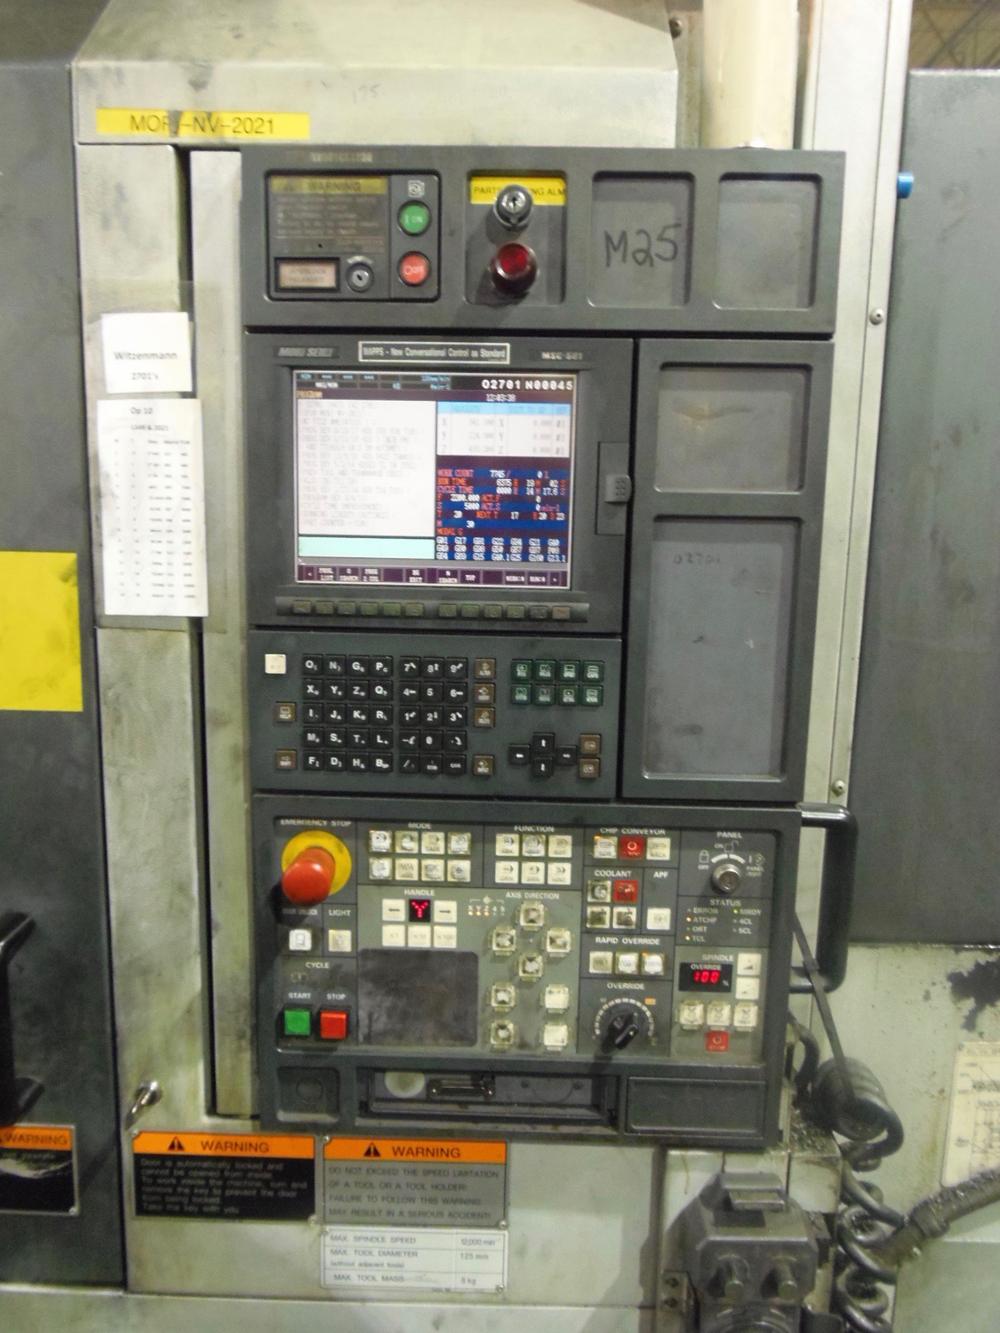 MORI SEIKI NV5000B/40, MSC-501, MAPPS, 12,000 RPM, 30 TOOLS, TSC, PALLET CHANGER, 2003